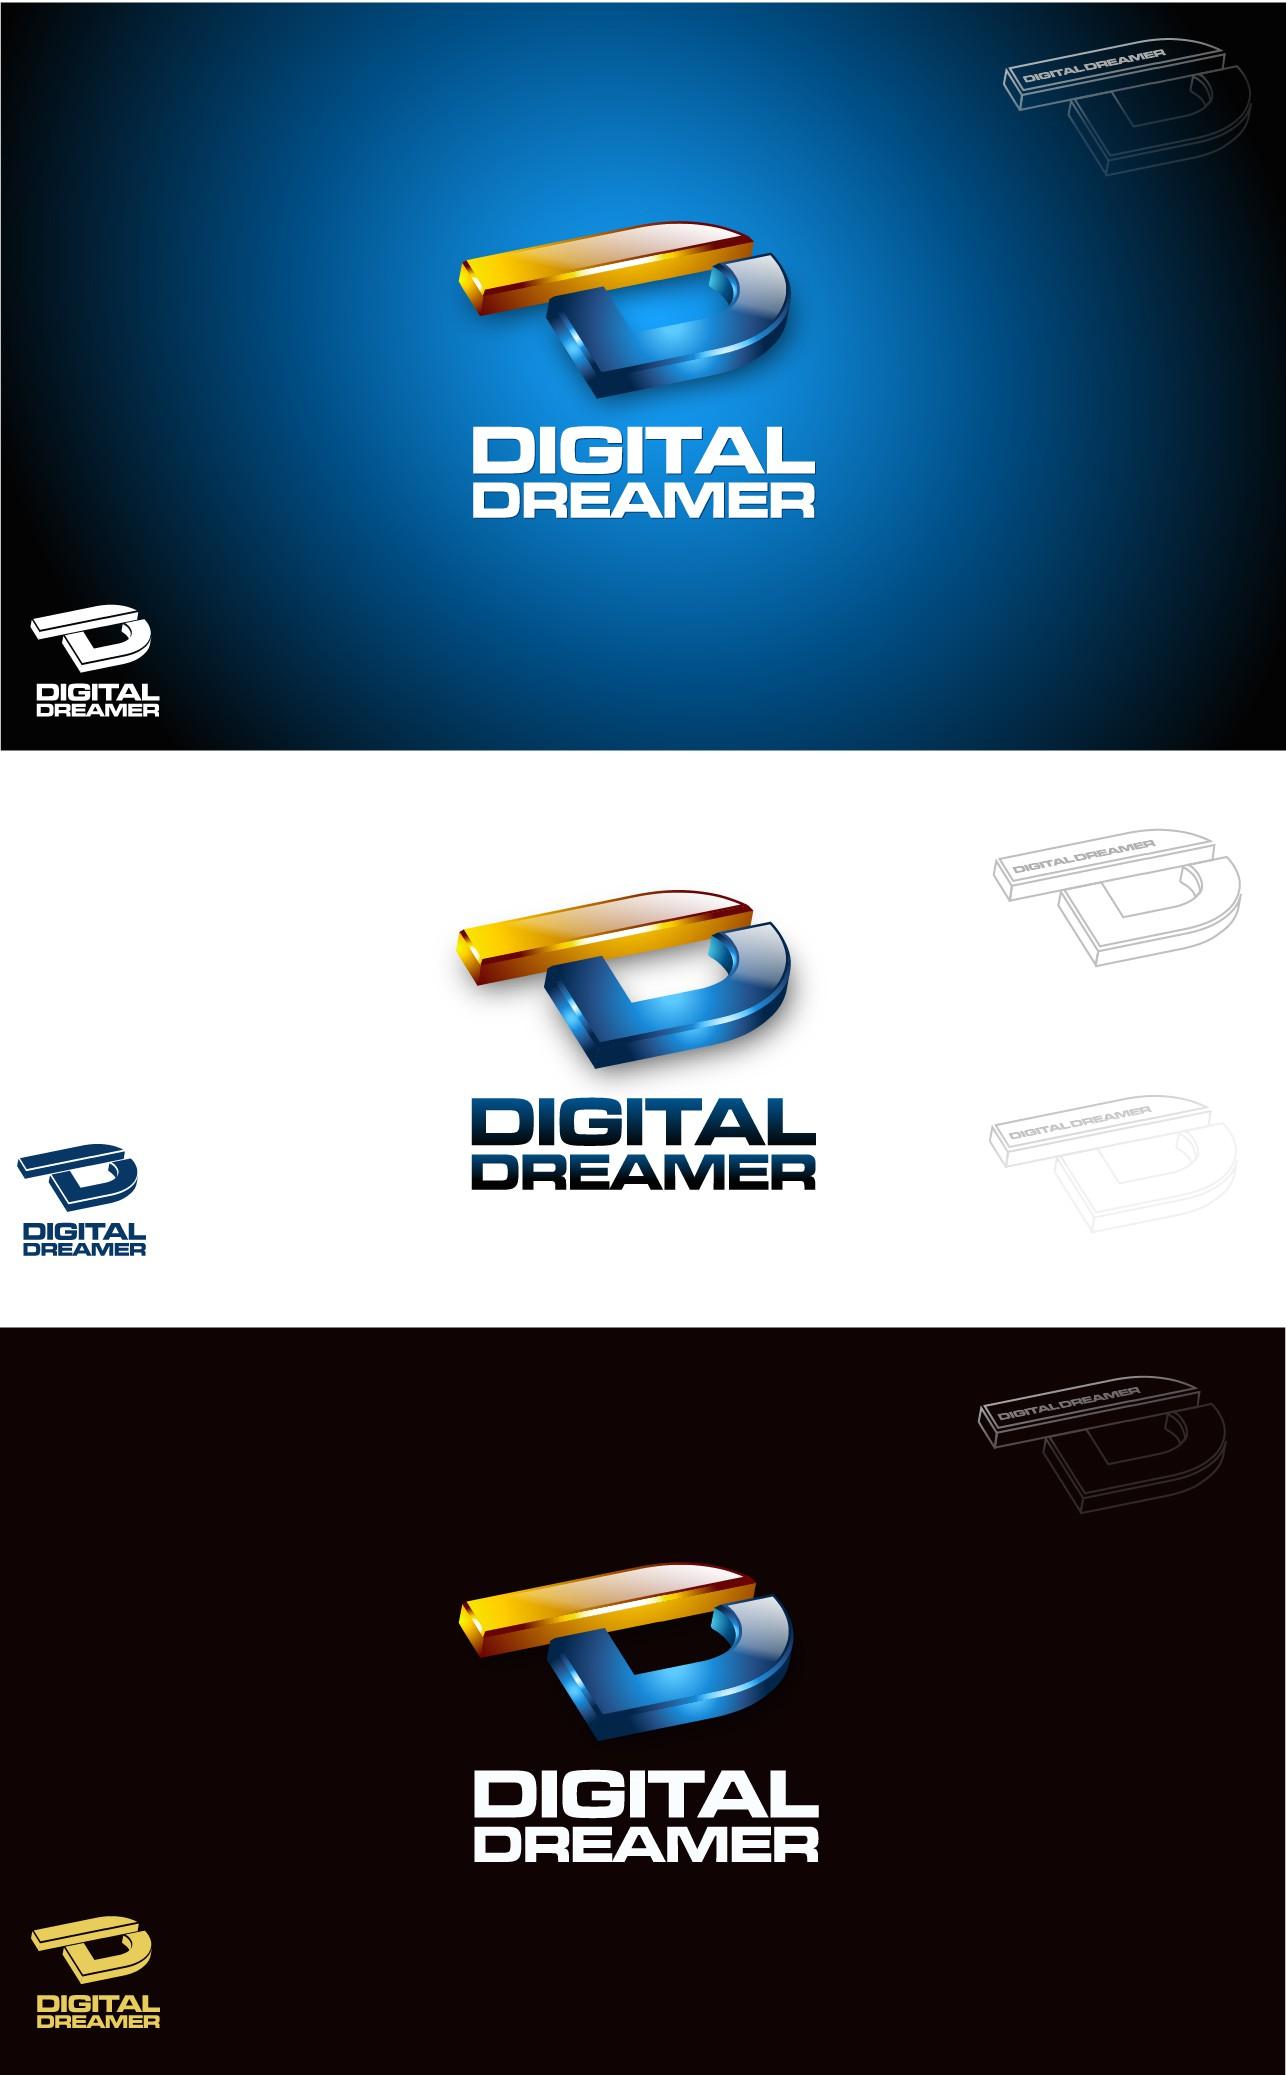 Create the next logo for Digital Dreamer